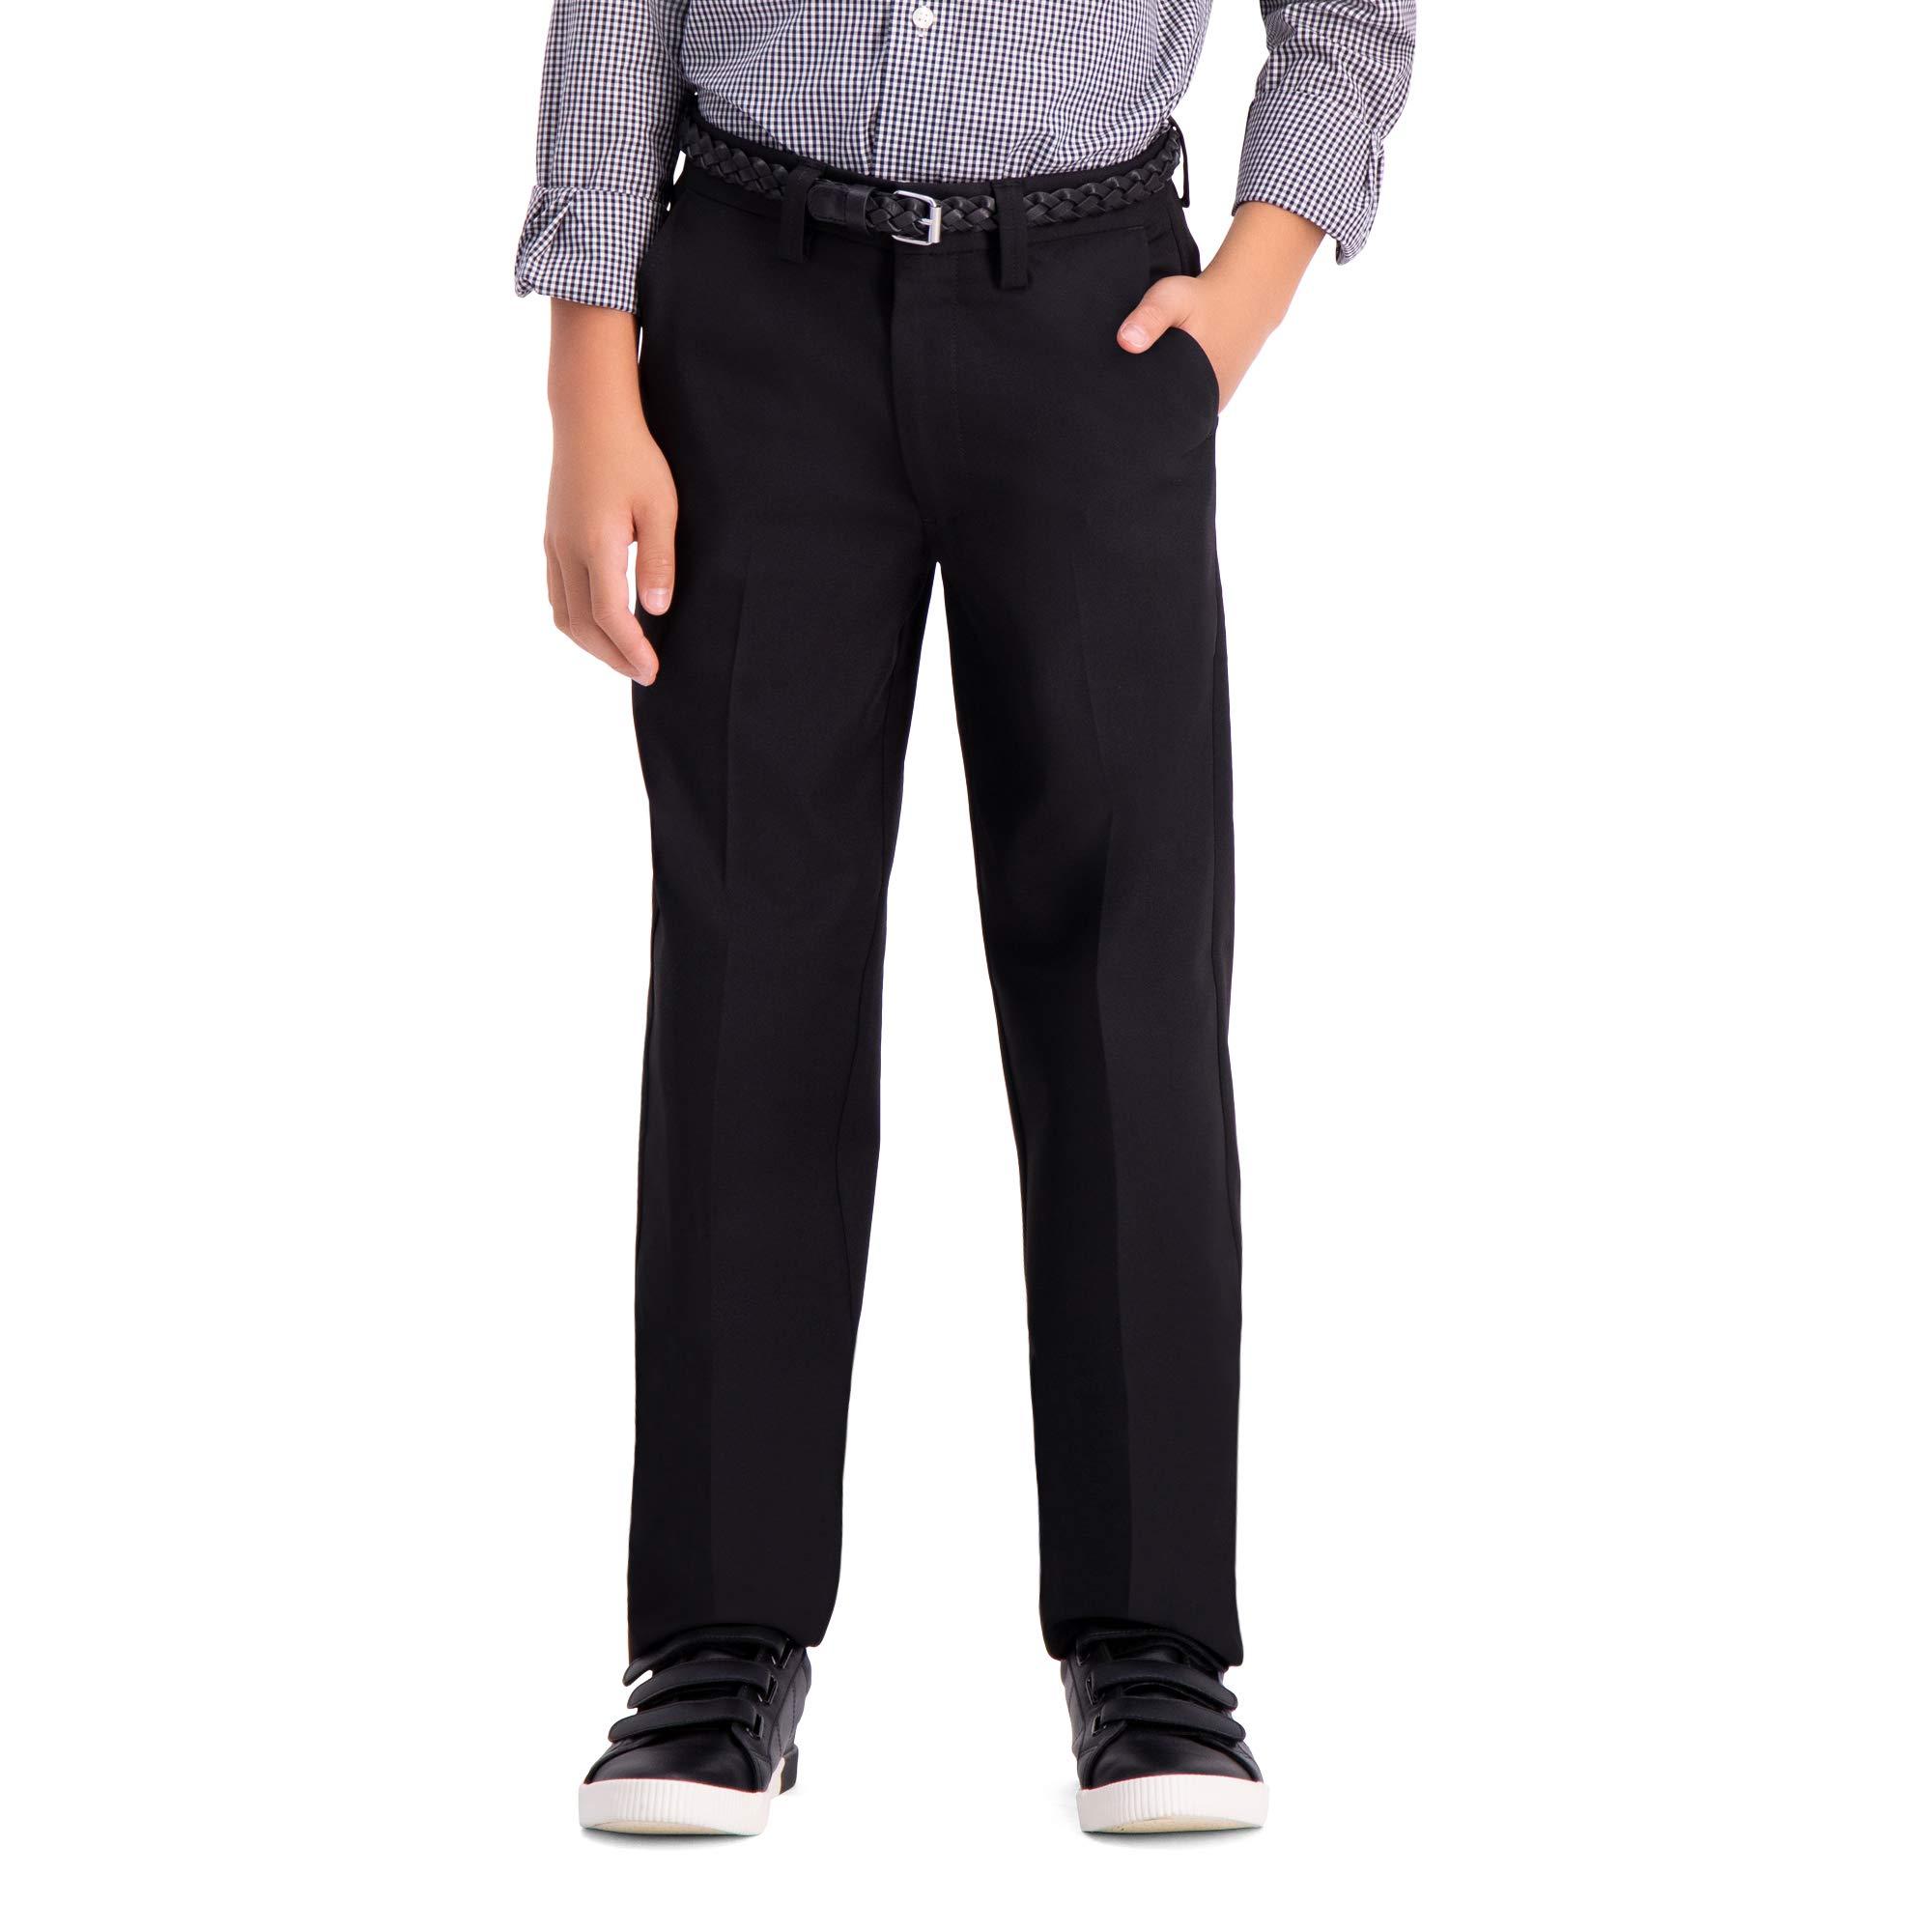 Haggar Big Boy's Youth Slim 8-20 Cool 18 PRO Pant, Black, 20 SLIM